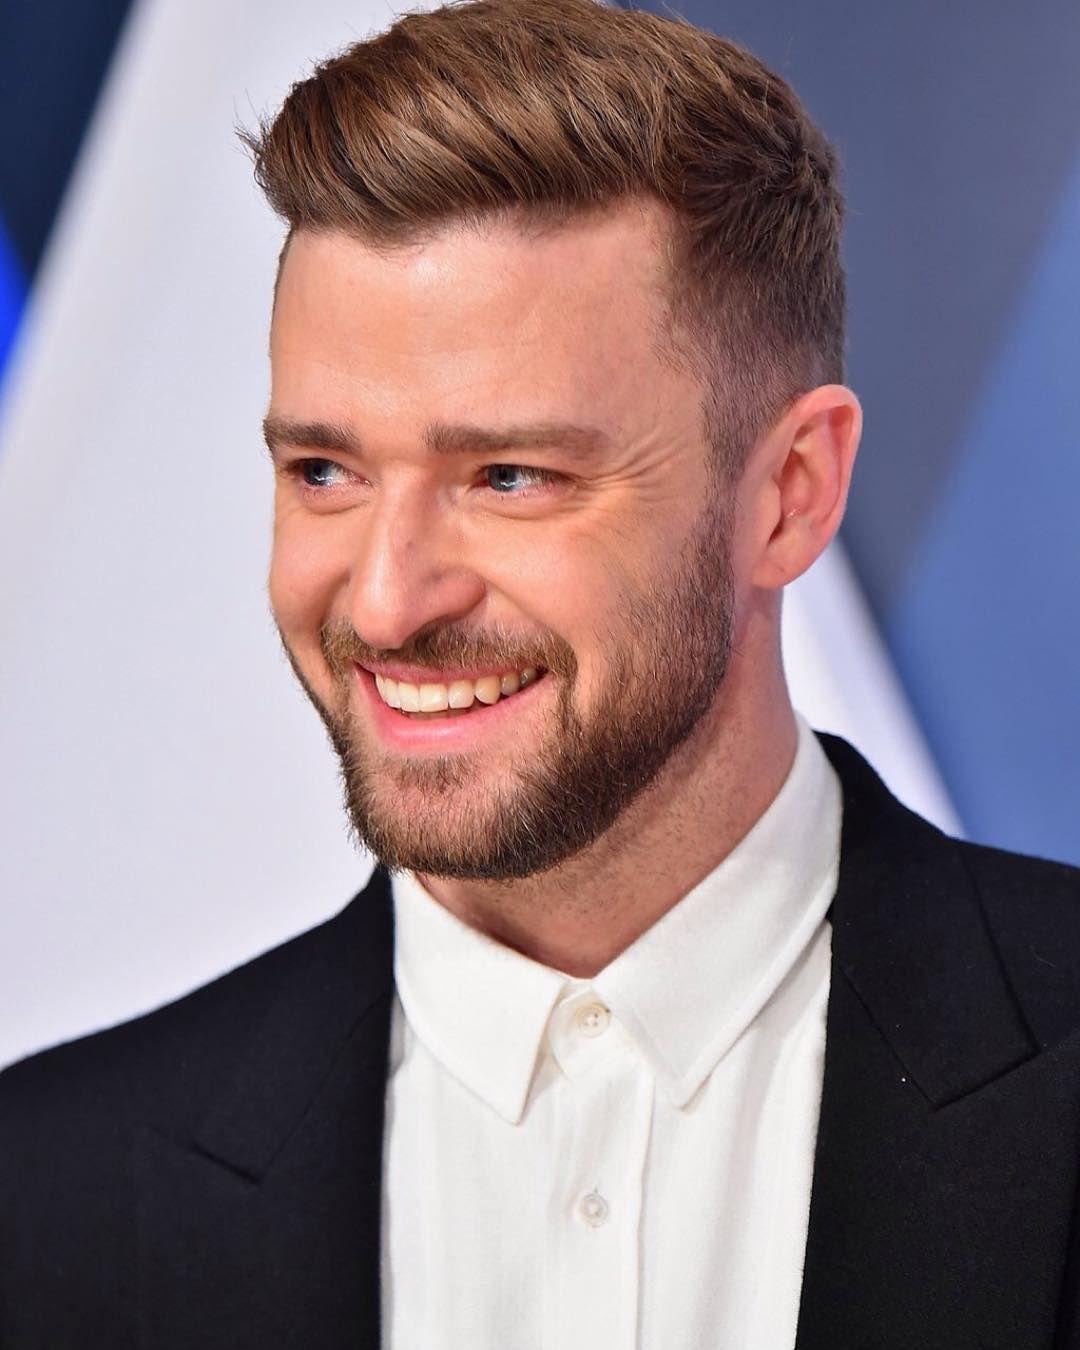 Justin Timberlake Celebrity Musicians Pinterest Justin